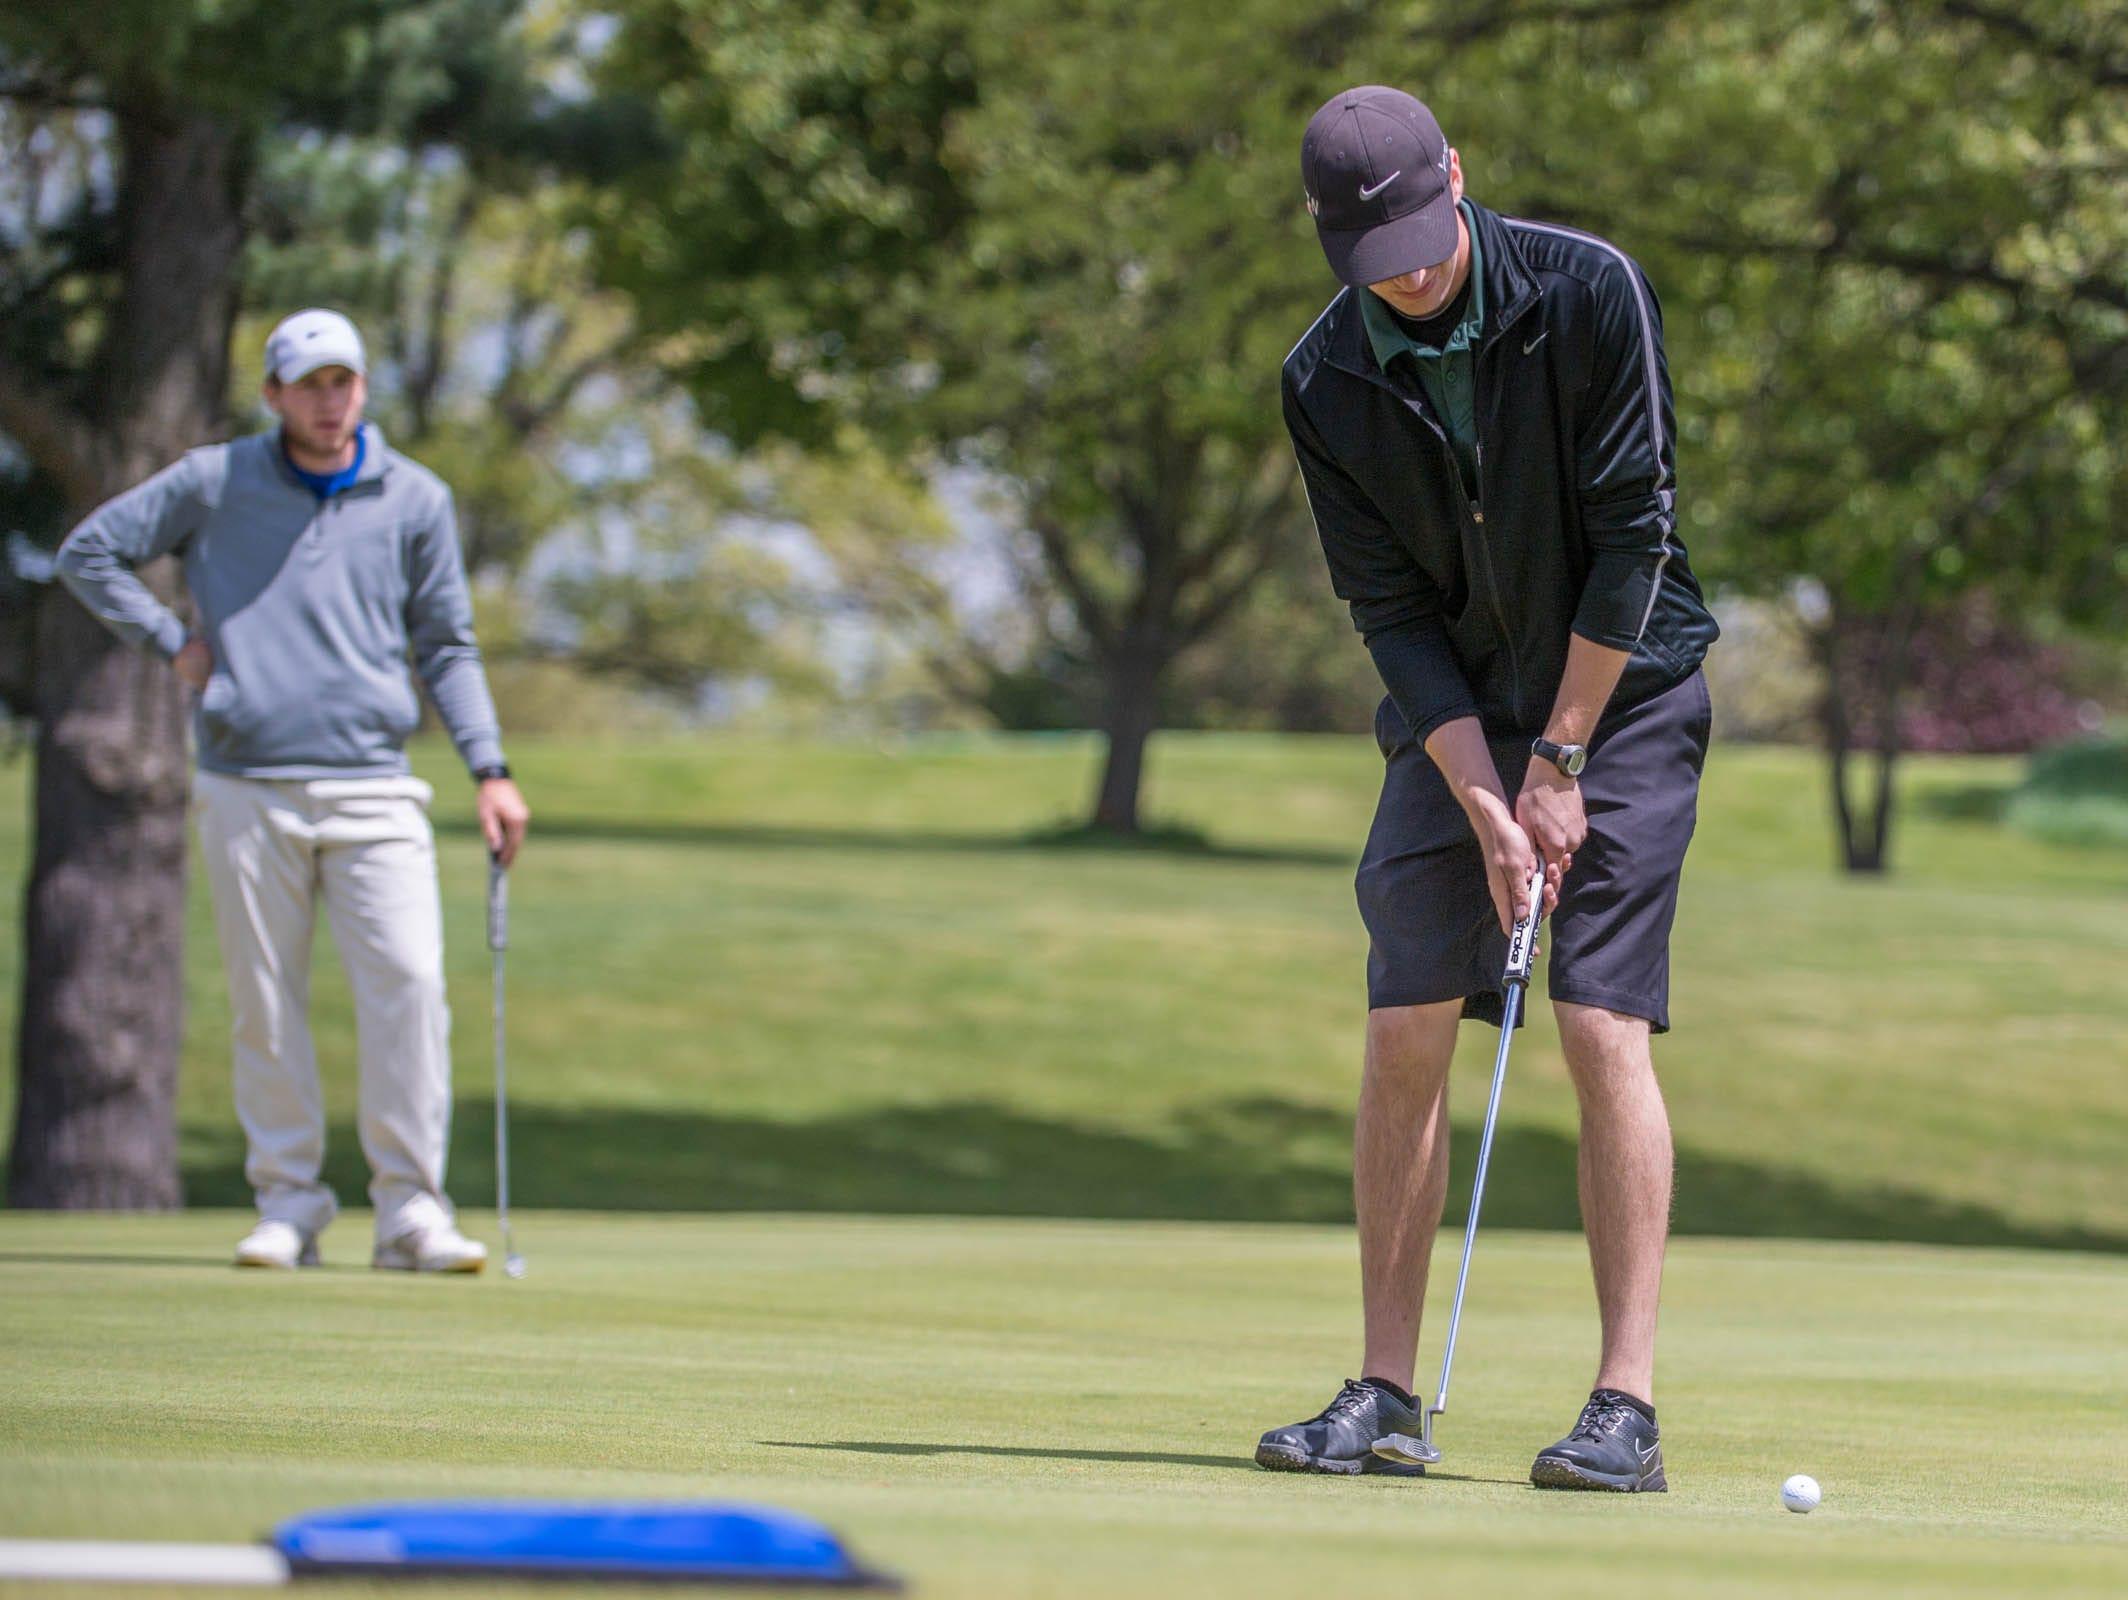 Pennfield senior Chase Williamson hits putts during All City High School Golf at Riverside Golf Club on Friday. Harper Creek junior Alex Johnson waits his turn.